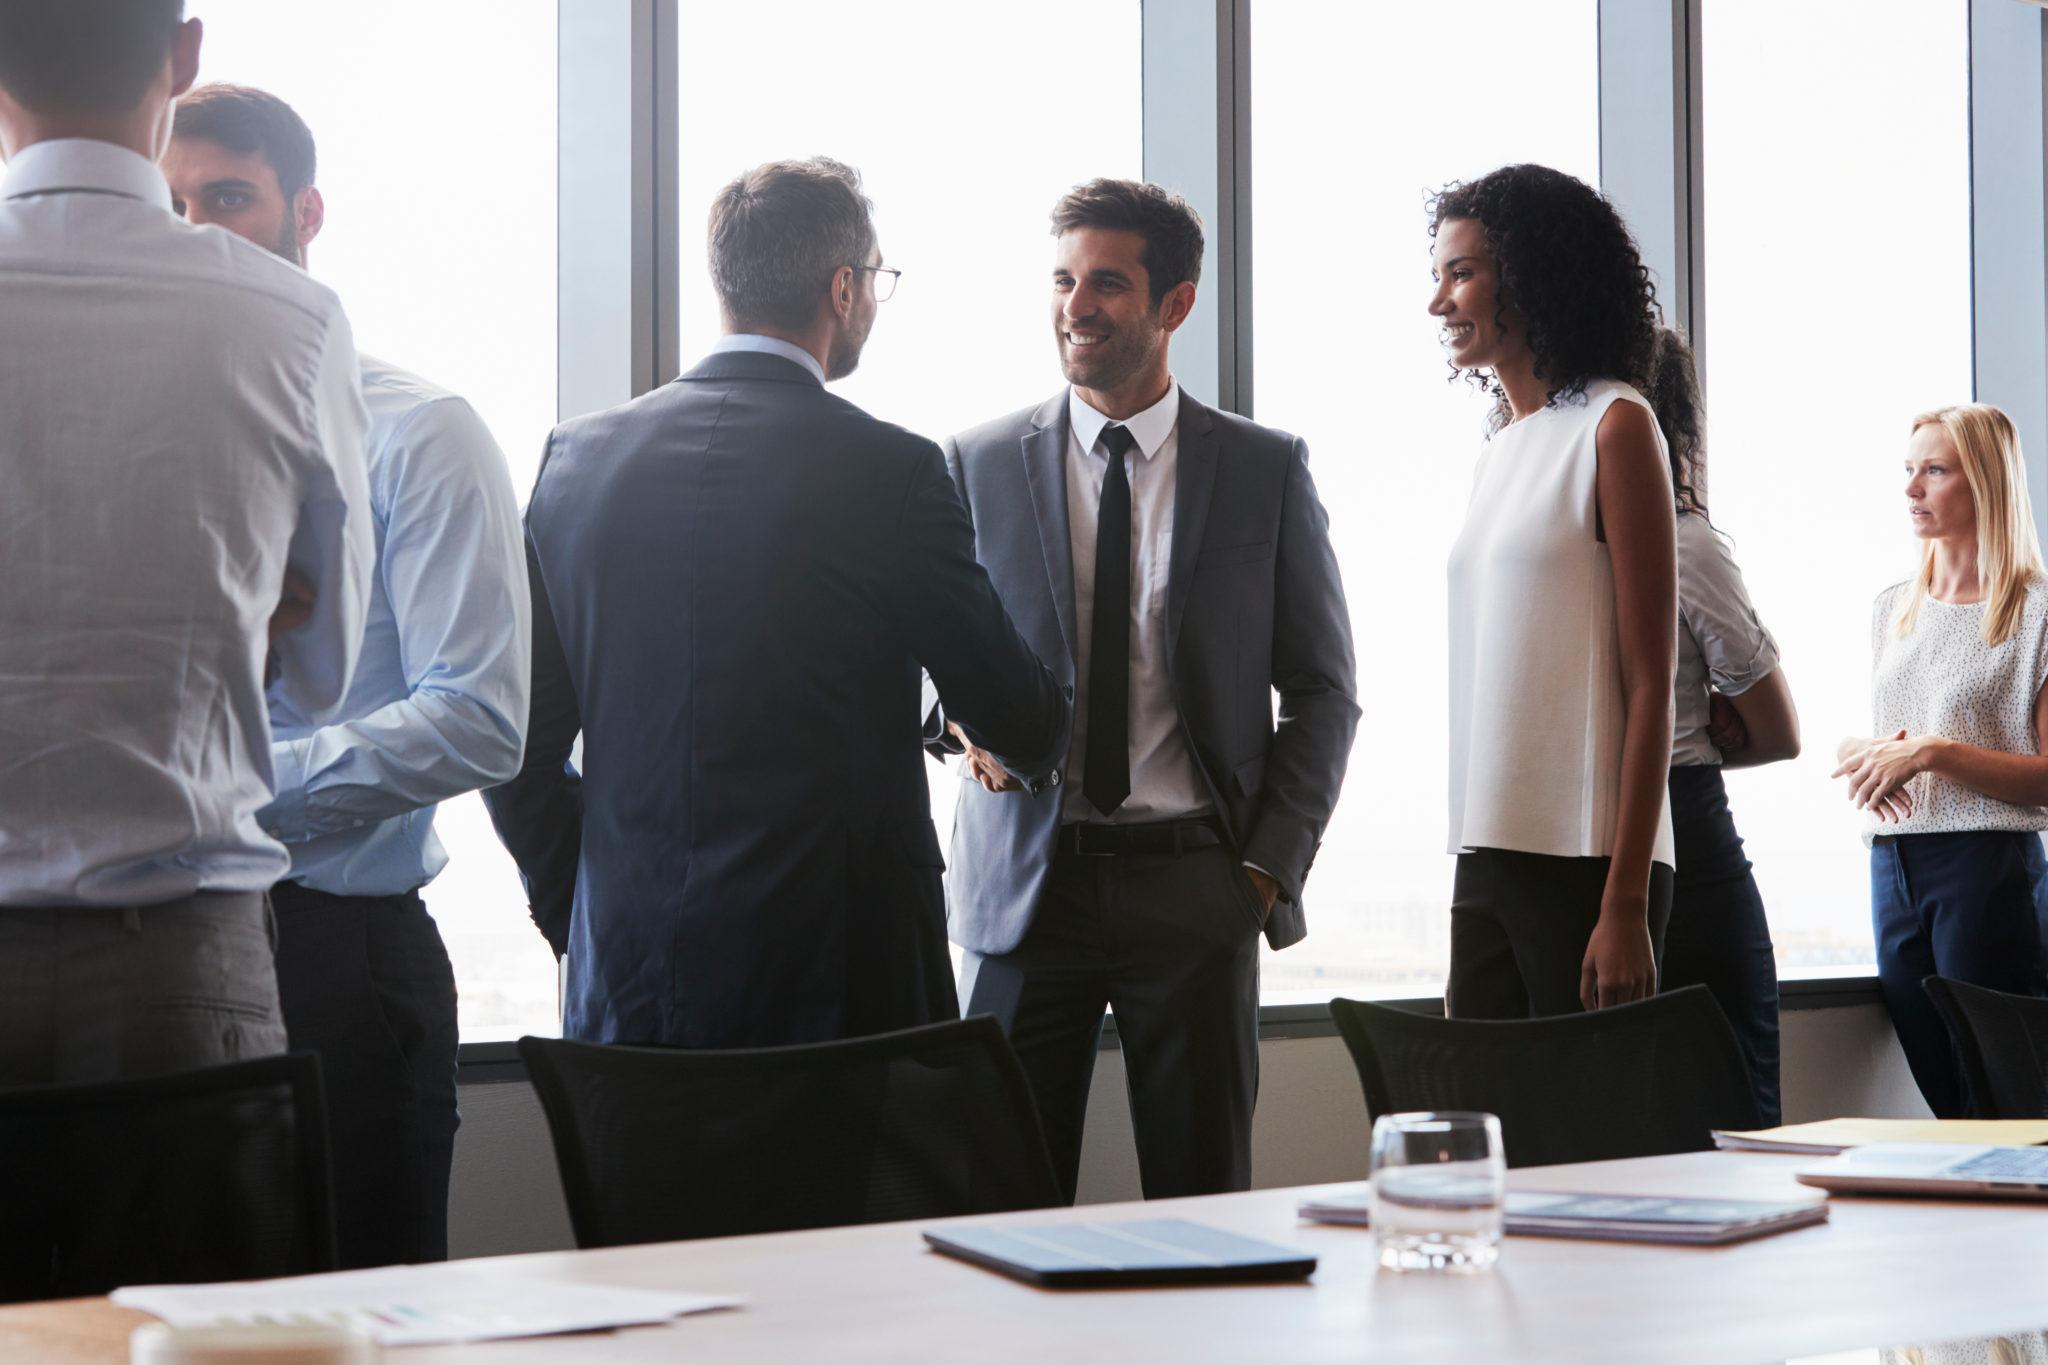 Businesspeople Shaking Hands Before Meeting In Boardroom